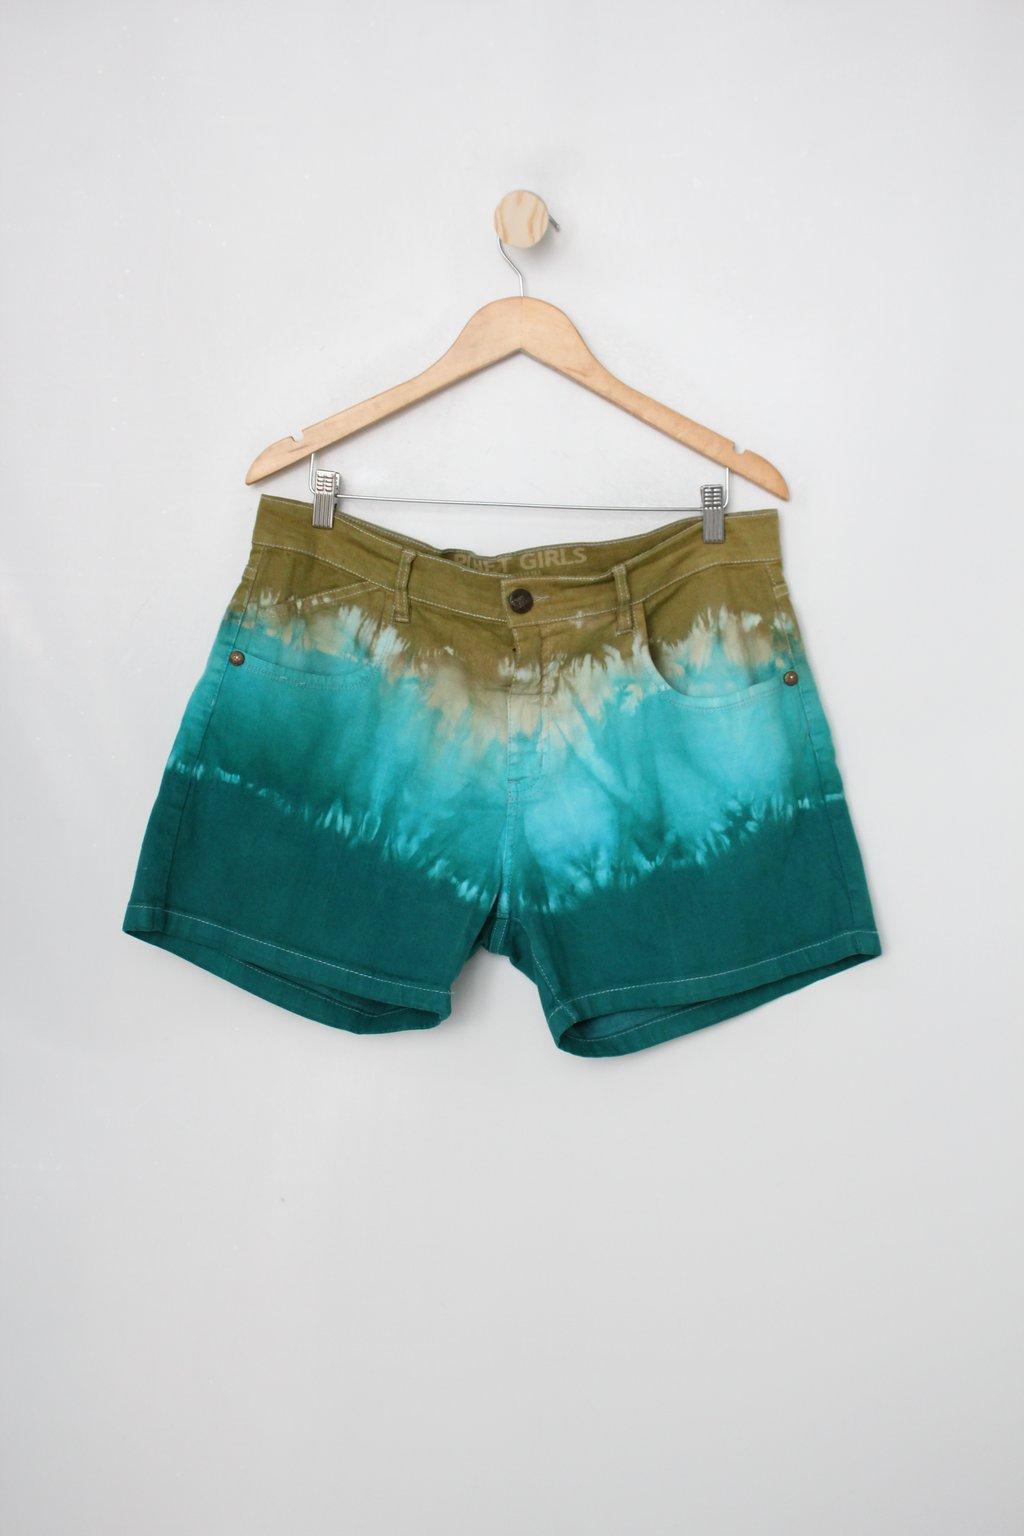 Shorts Planet Girls Feminino Com Tie Dye Verde